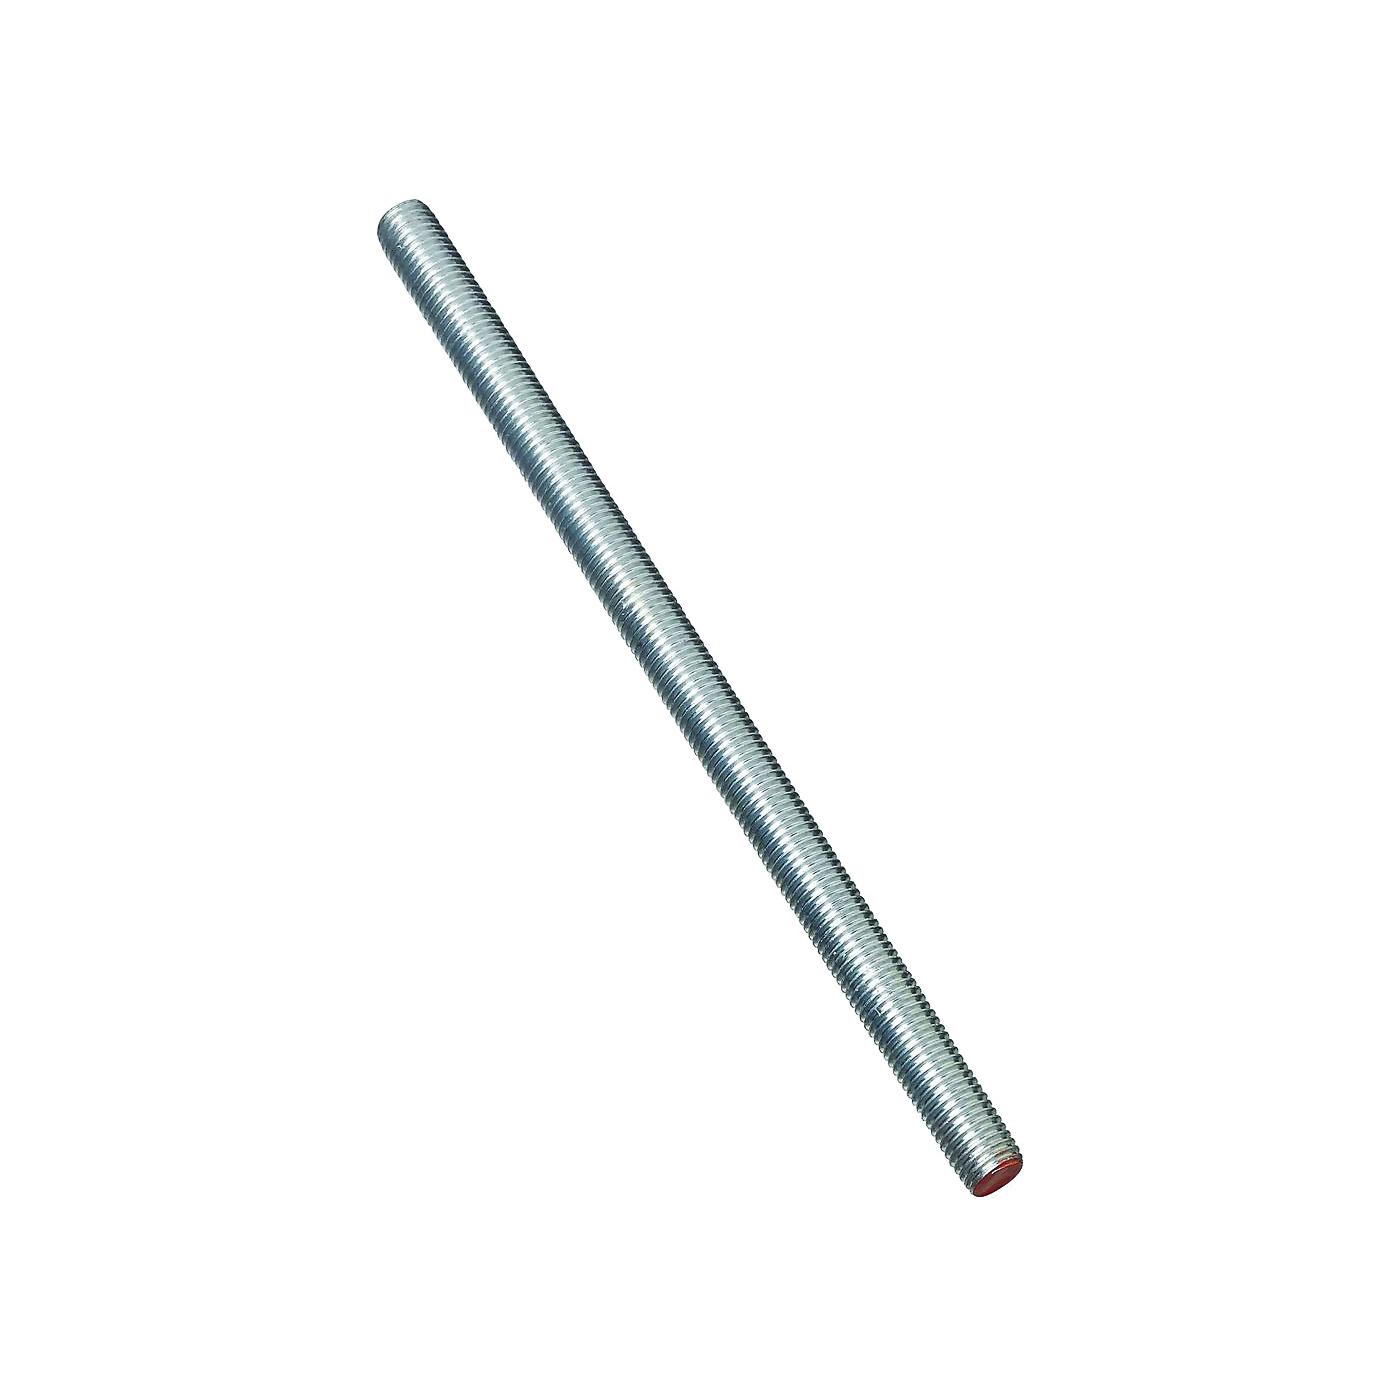 Picture of Stanley Hardware 179630 Threaded Rod, 5/8-11 Thread, 72 in L, A Grade, Steel, Zinc, UNC Thread